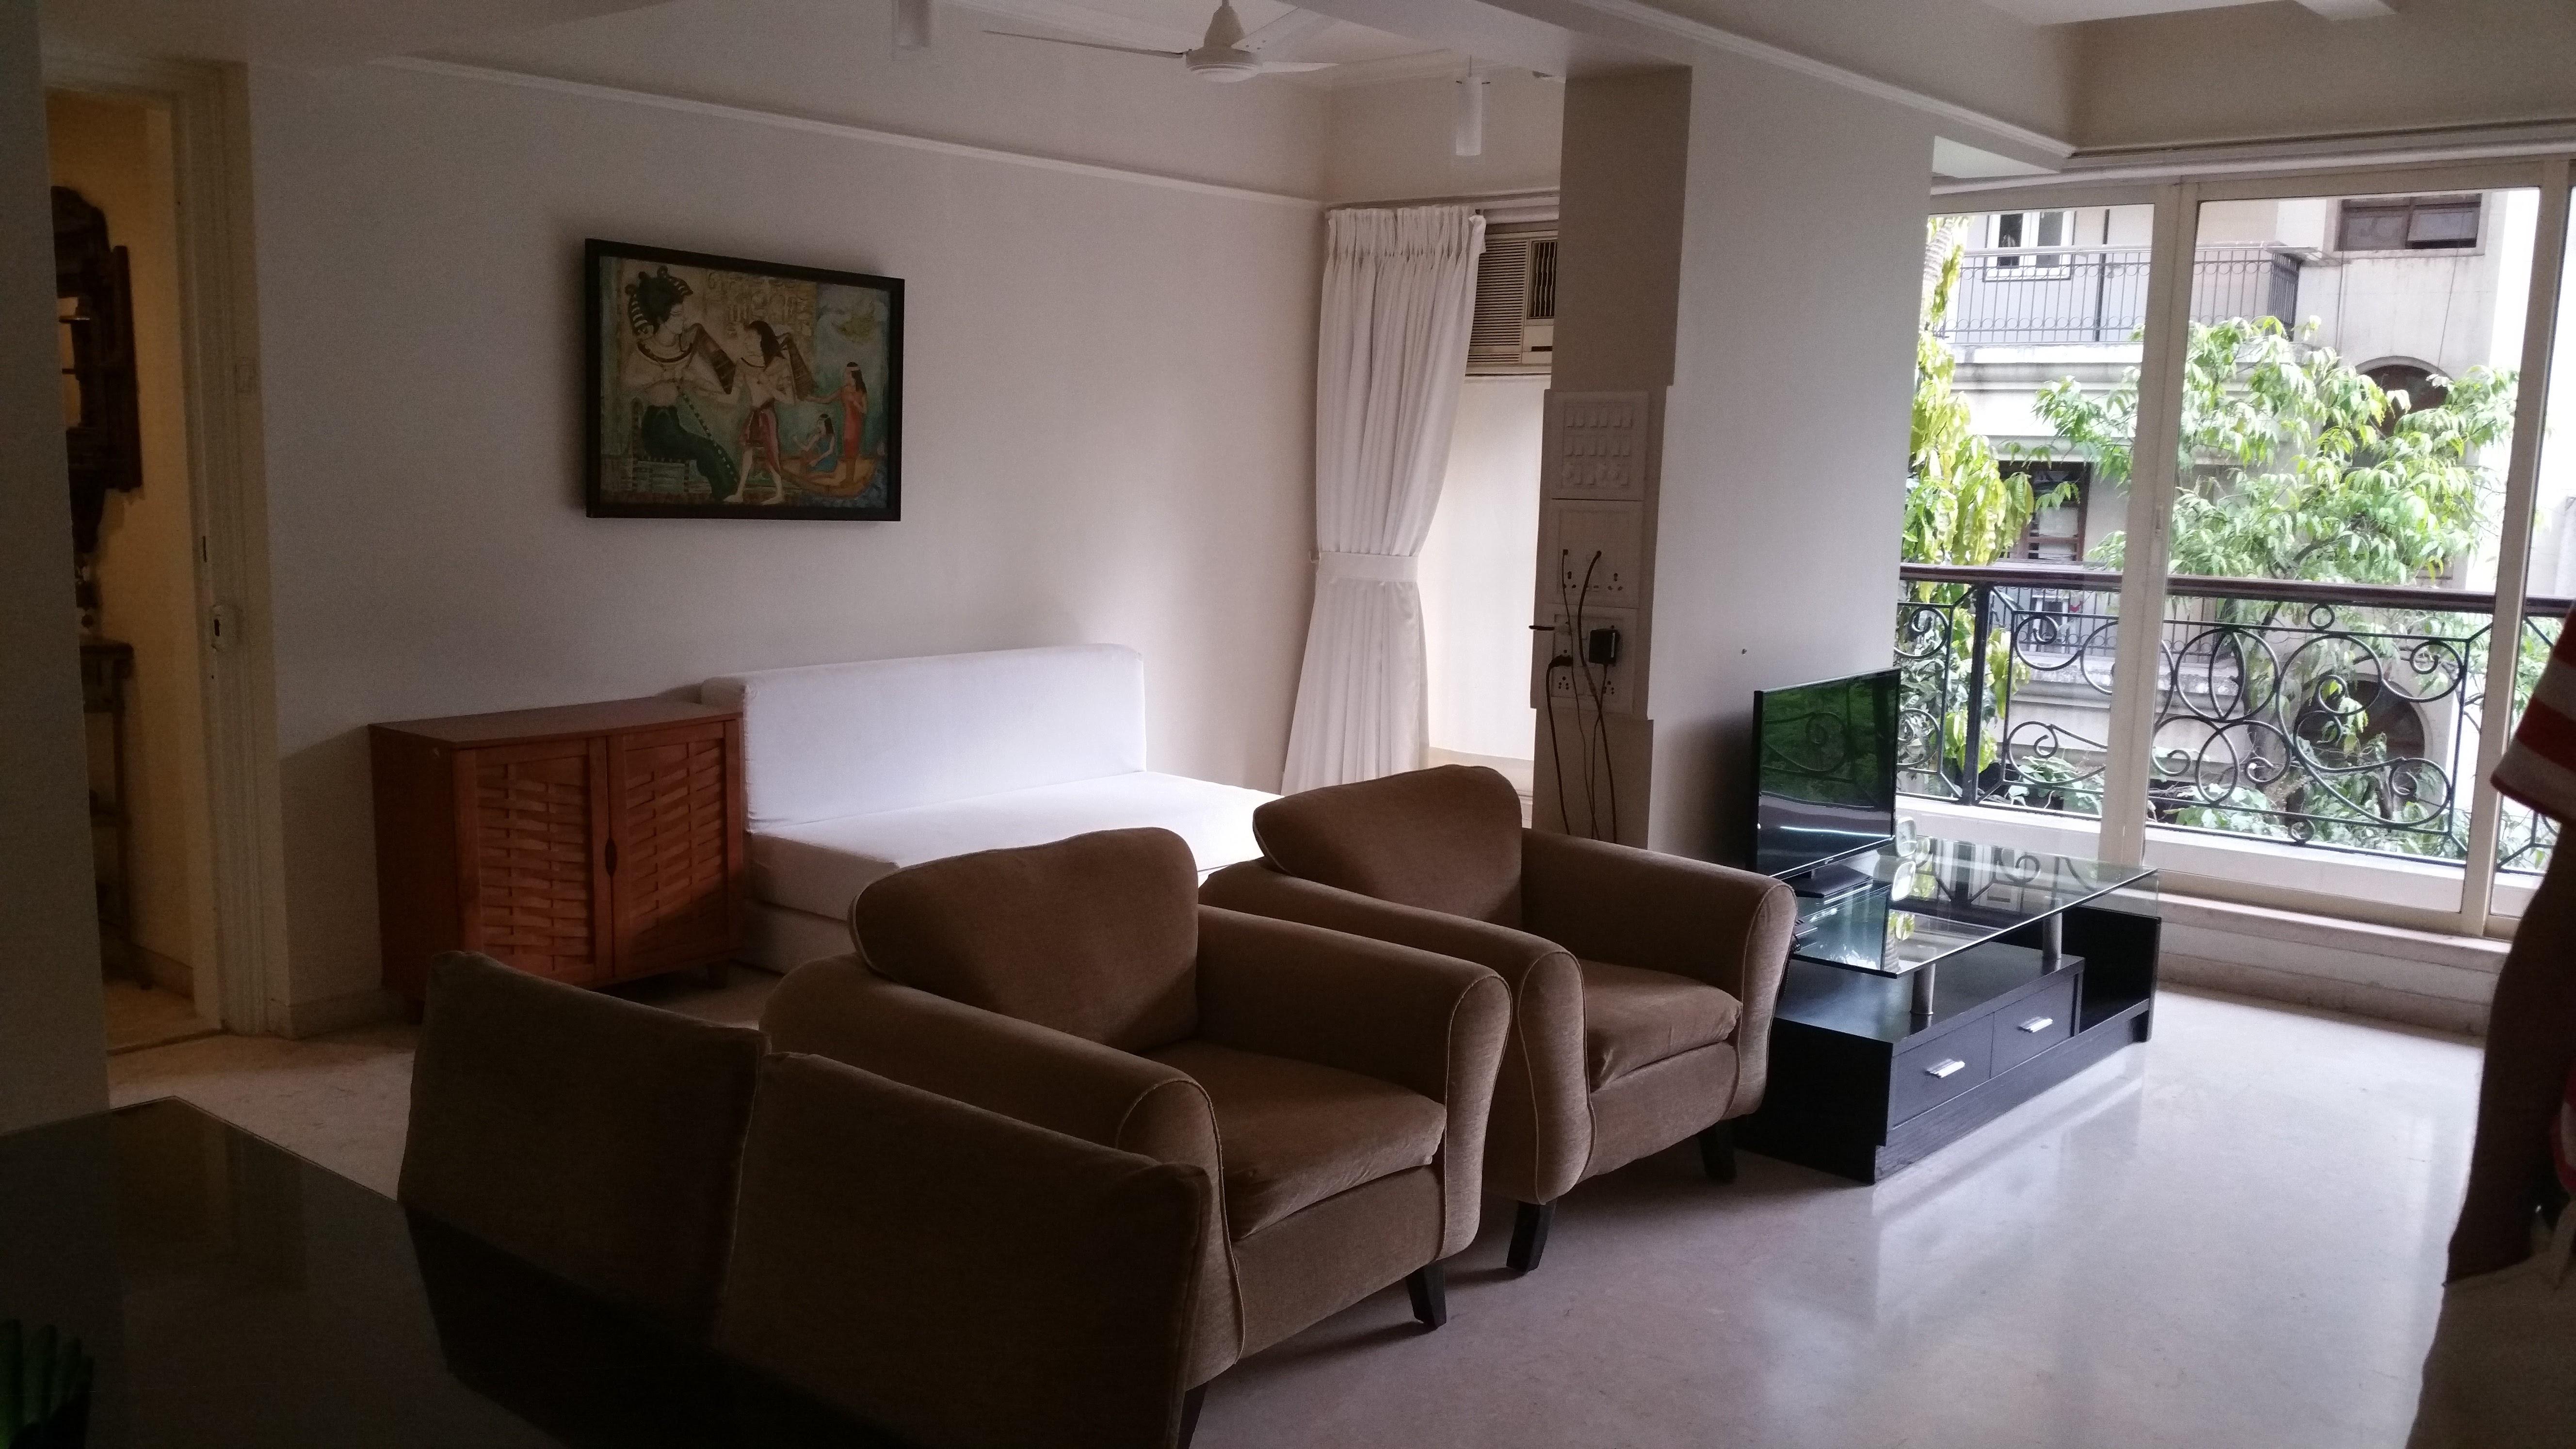 Monthly rental 2 bedroom service apartment santacruz for Cost to clean 2 bedroom apartment